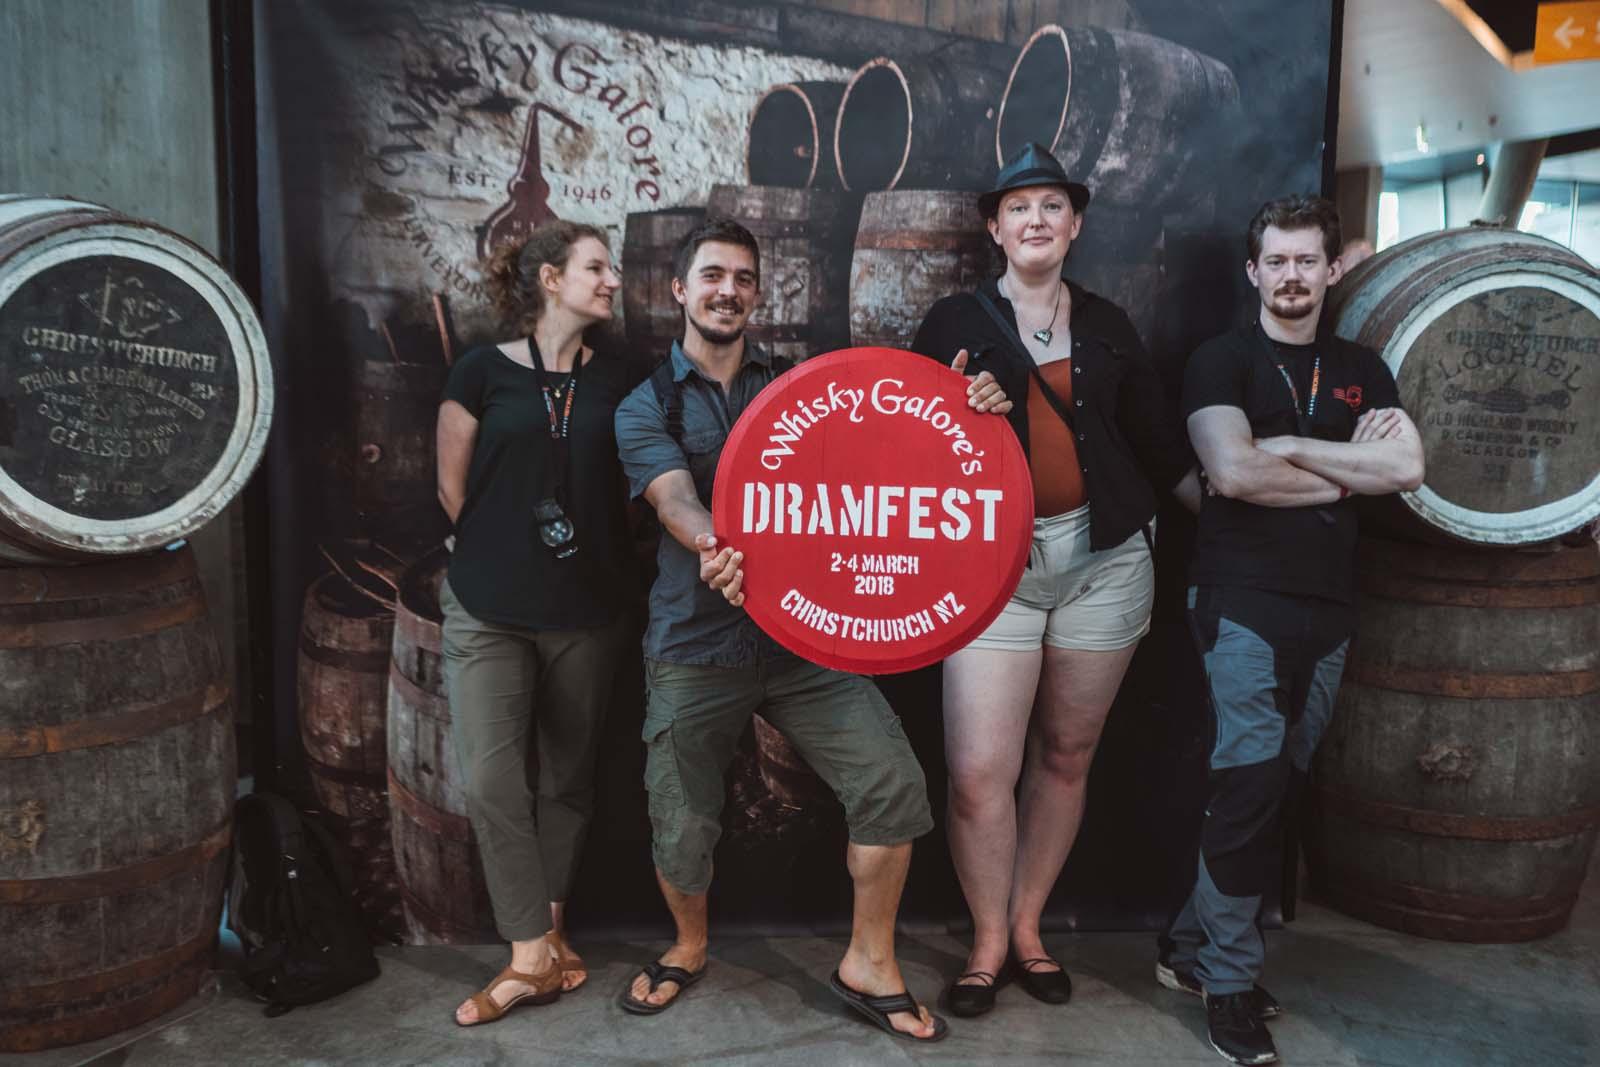 Dramfest 2018 for Whisky Galore-151.jpg